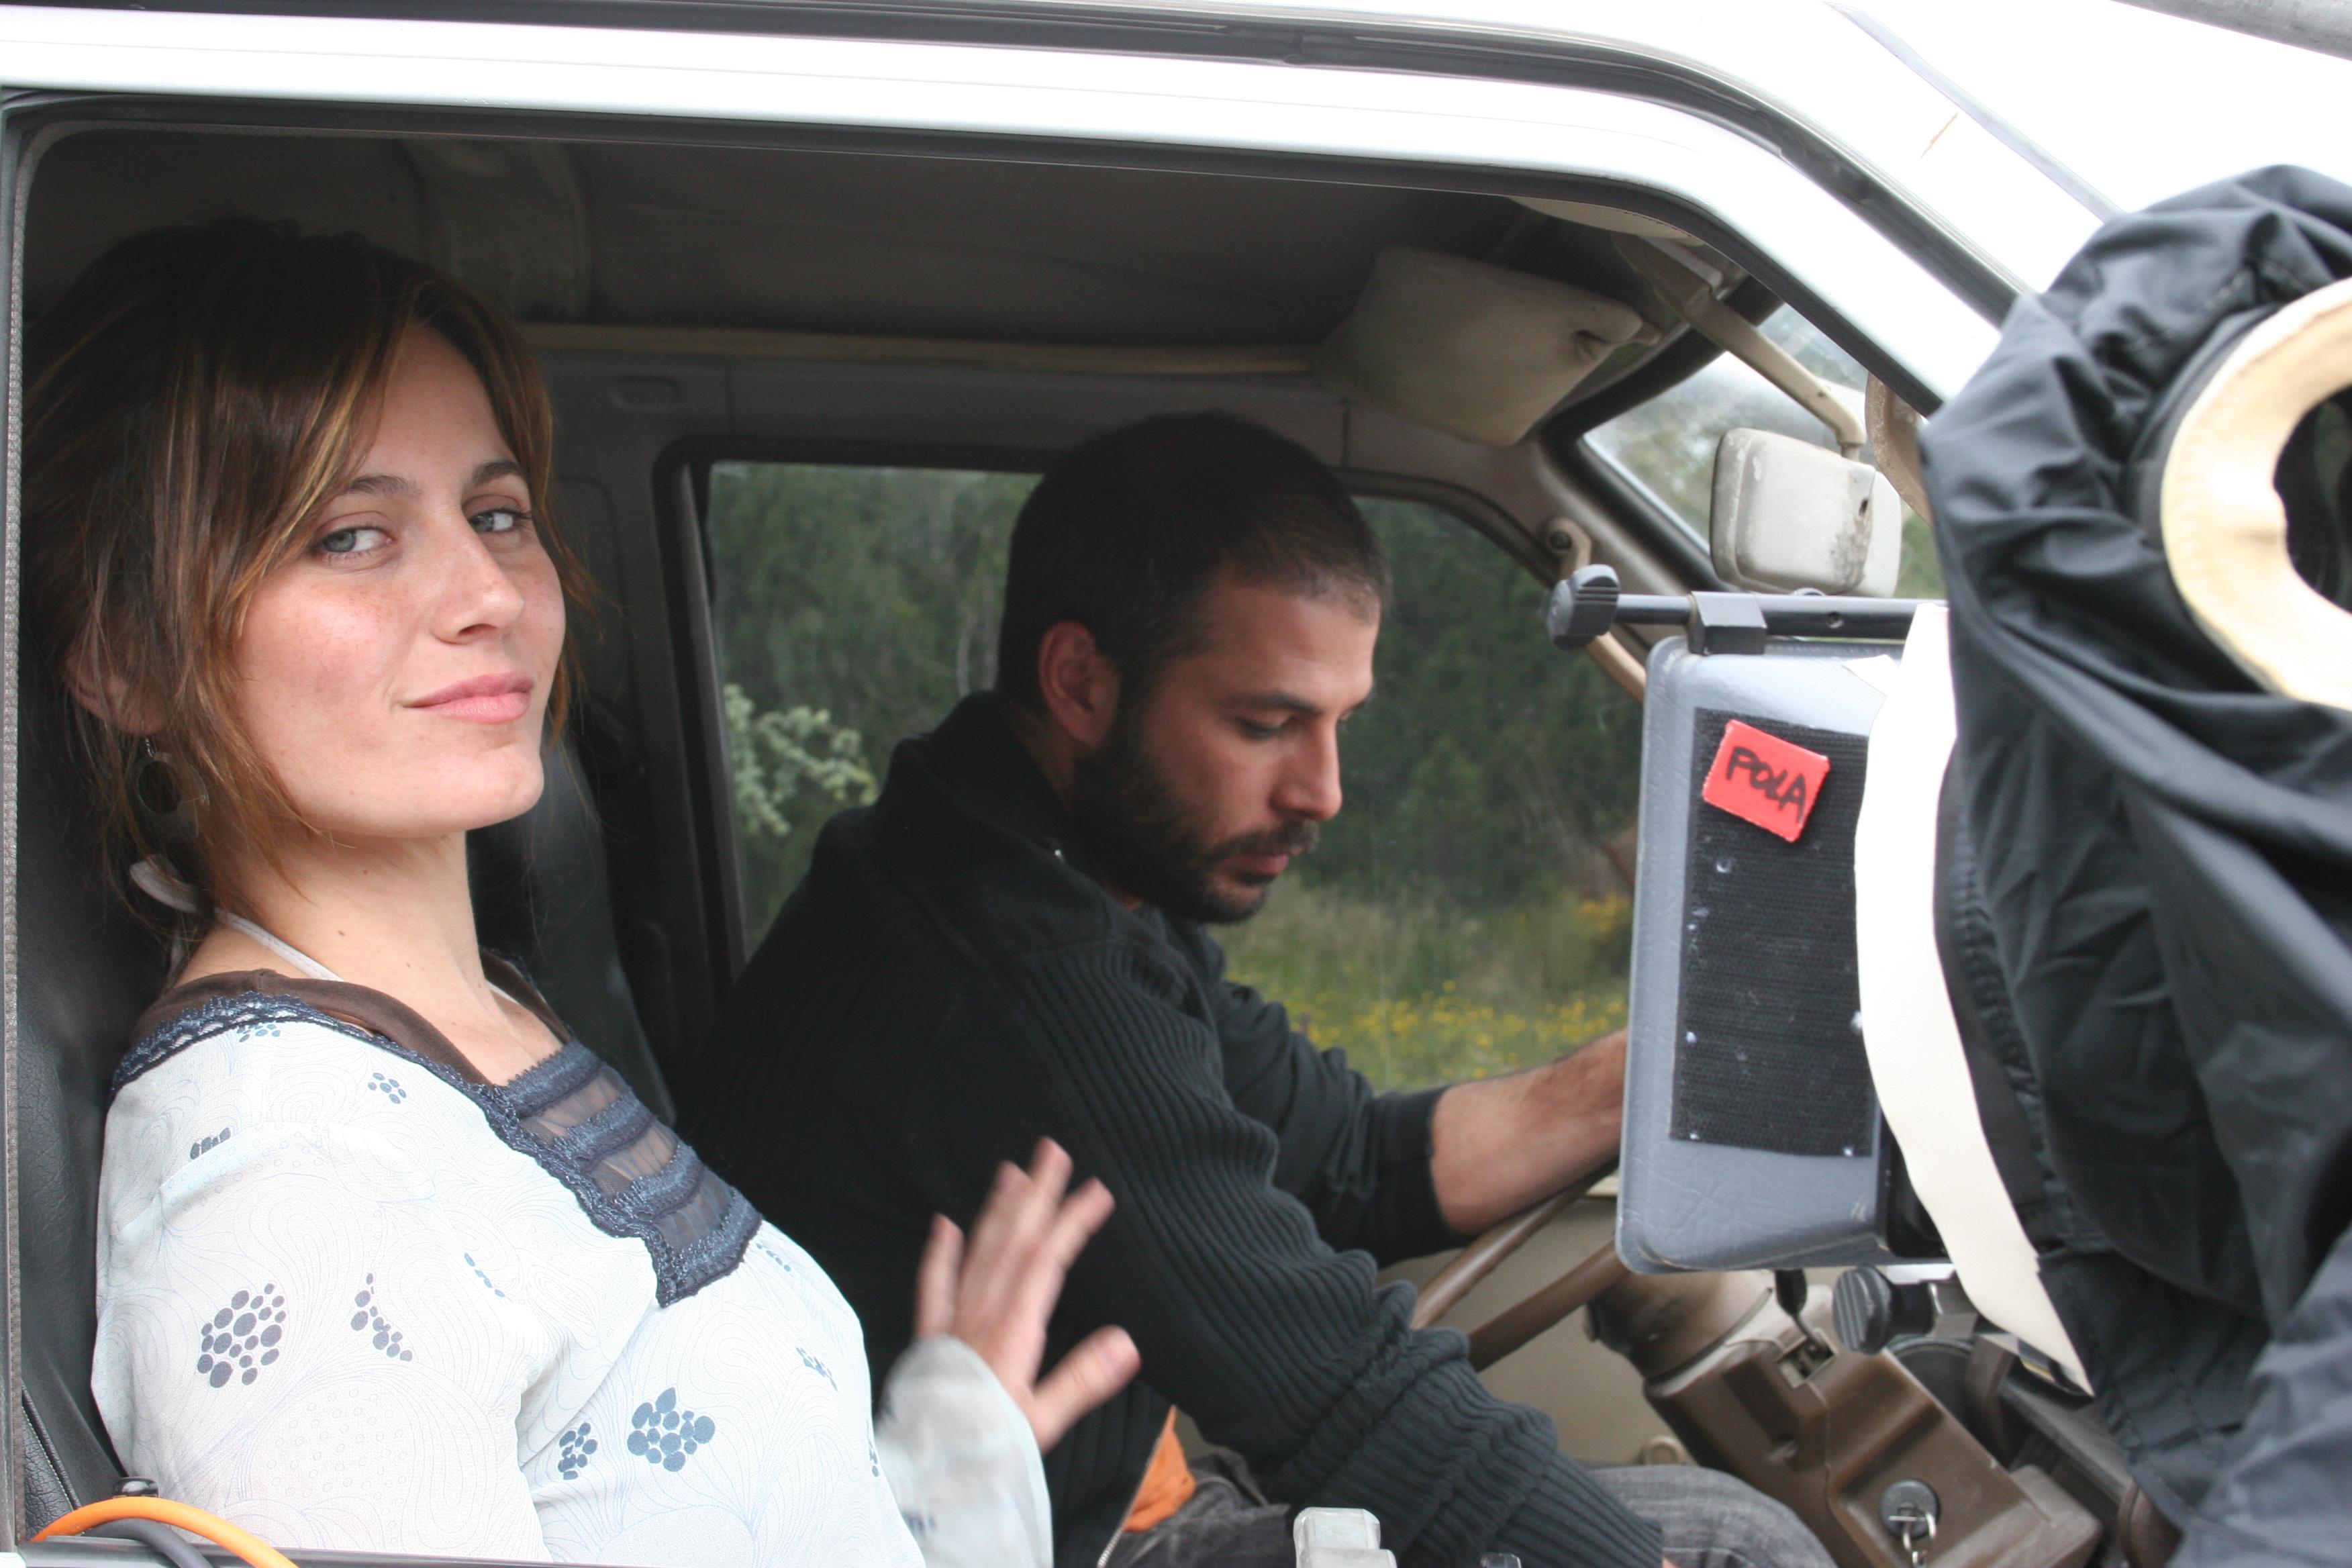 Tzeitel Rodríguez and David Bendito in Bolboreta, mariposa, papallona (2007)